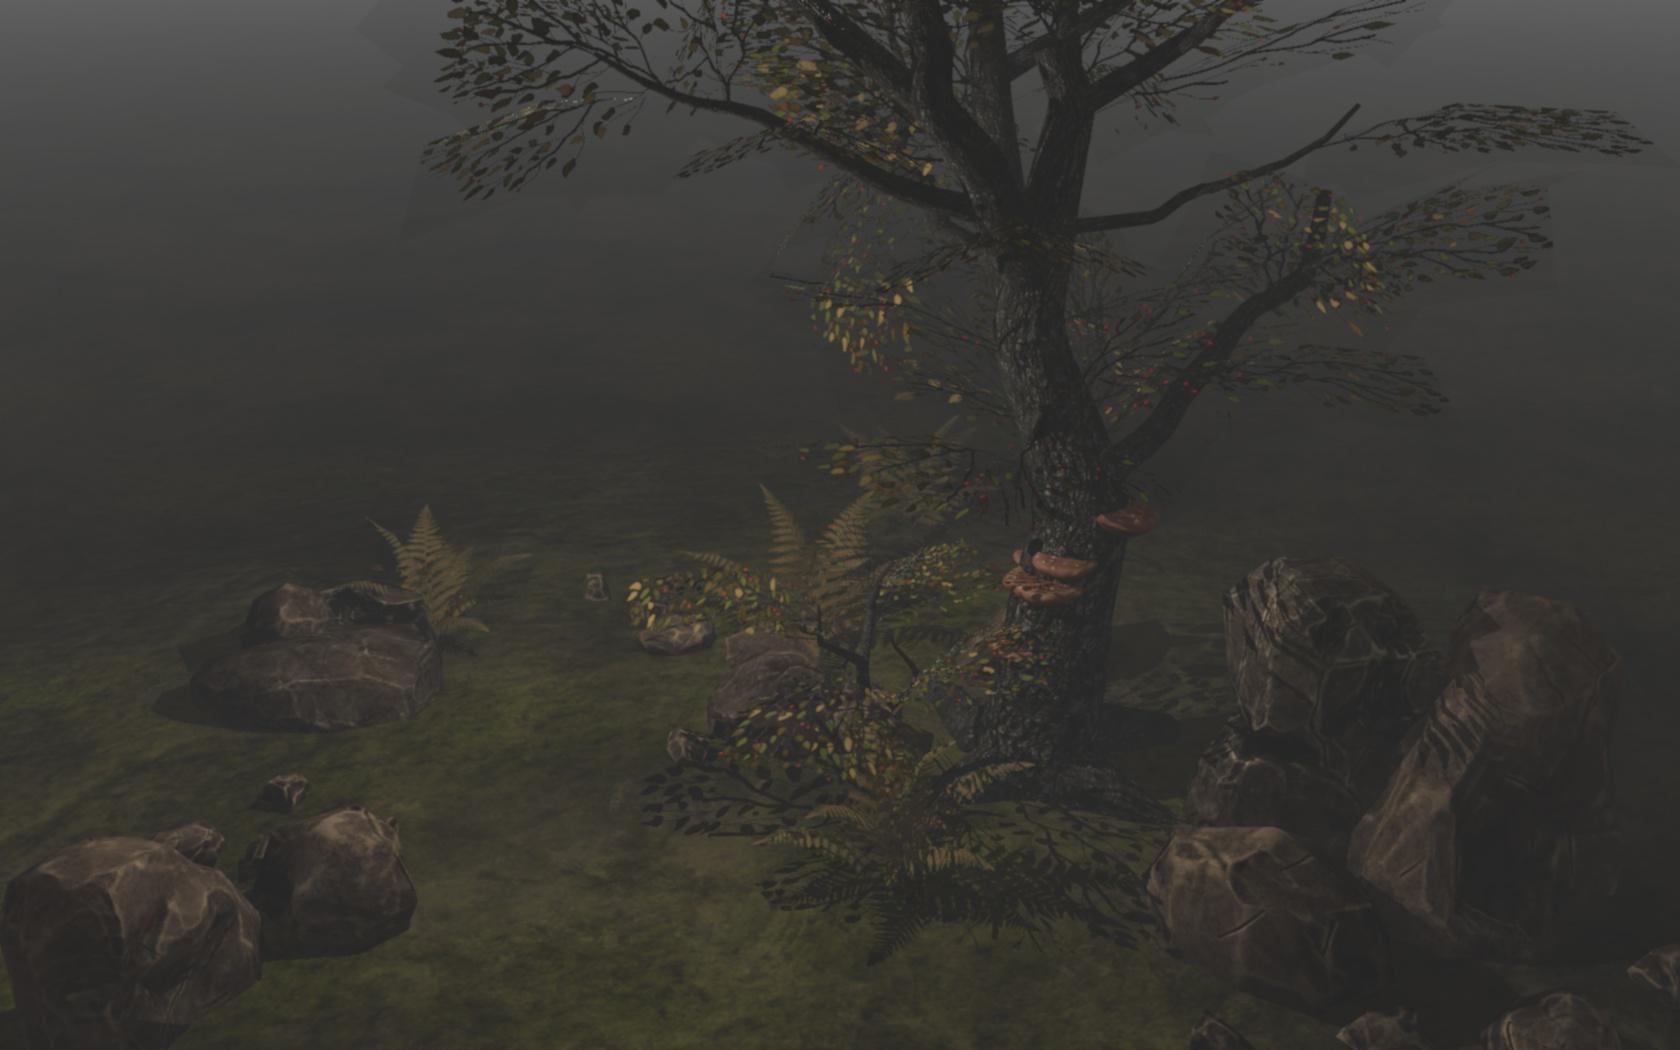 tree1_0029.jpg